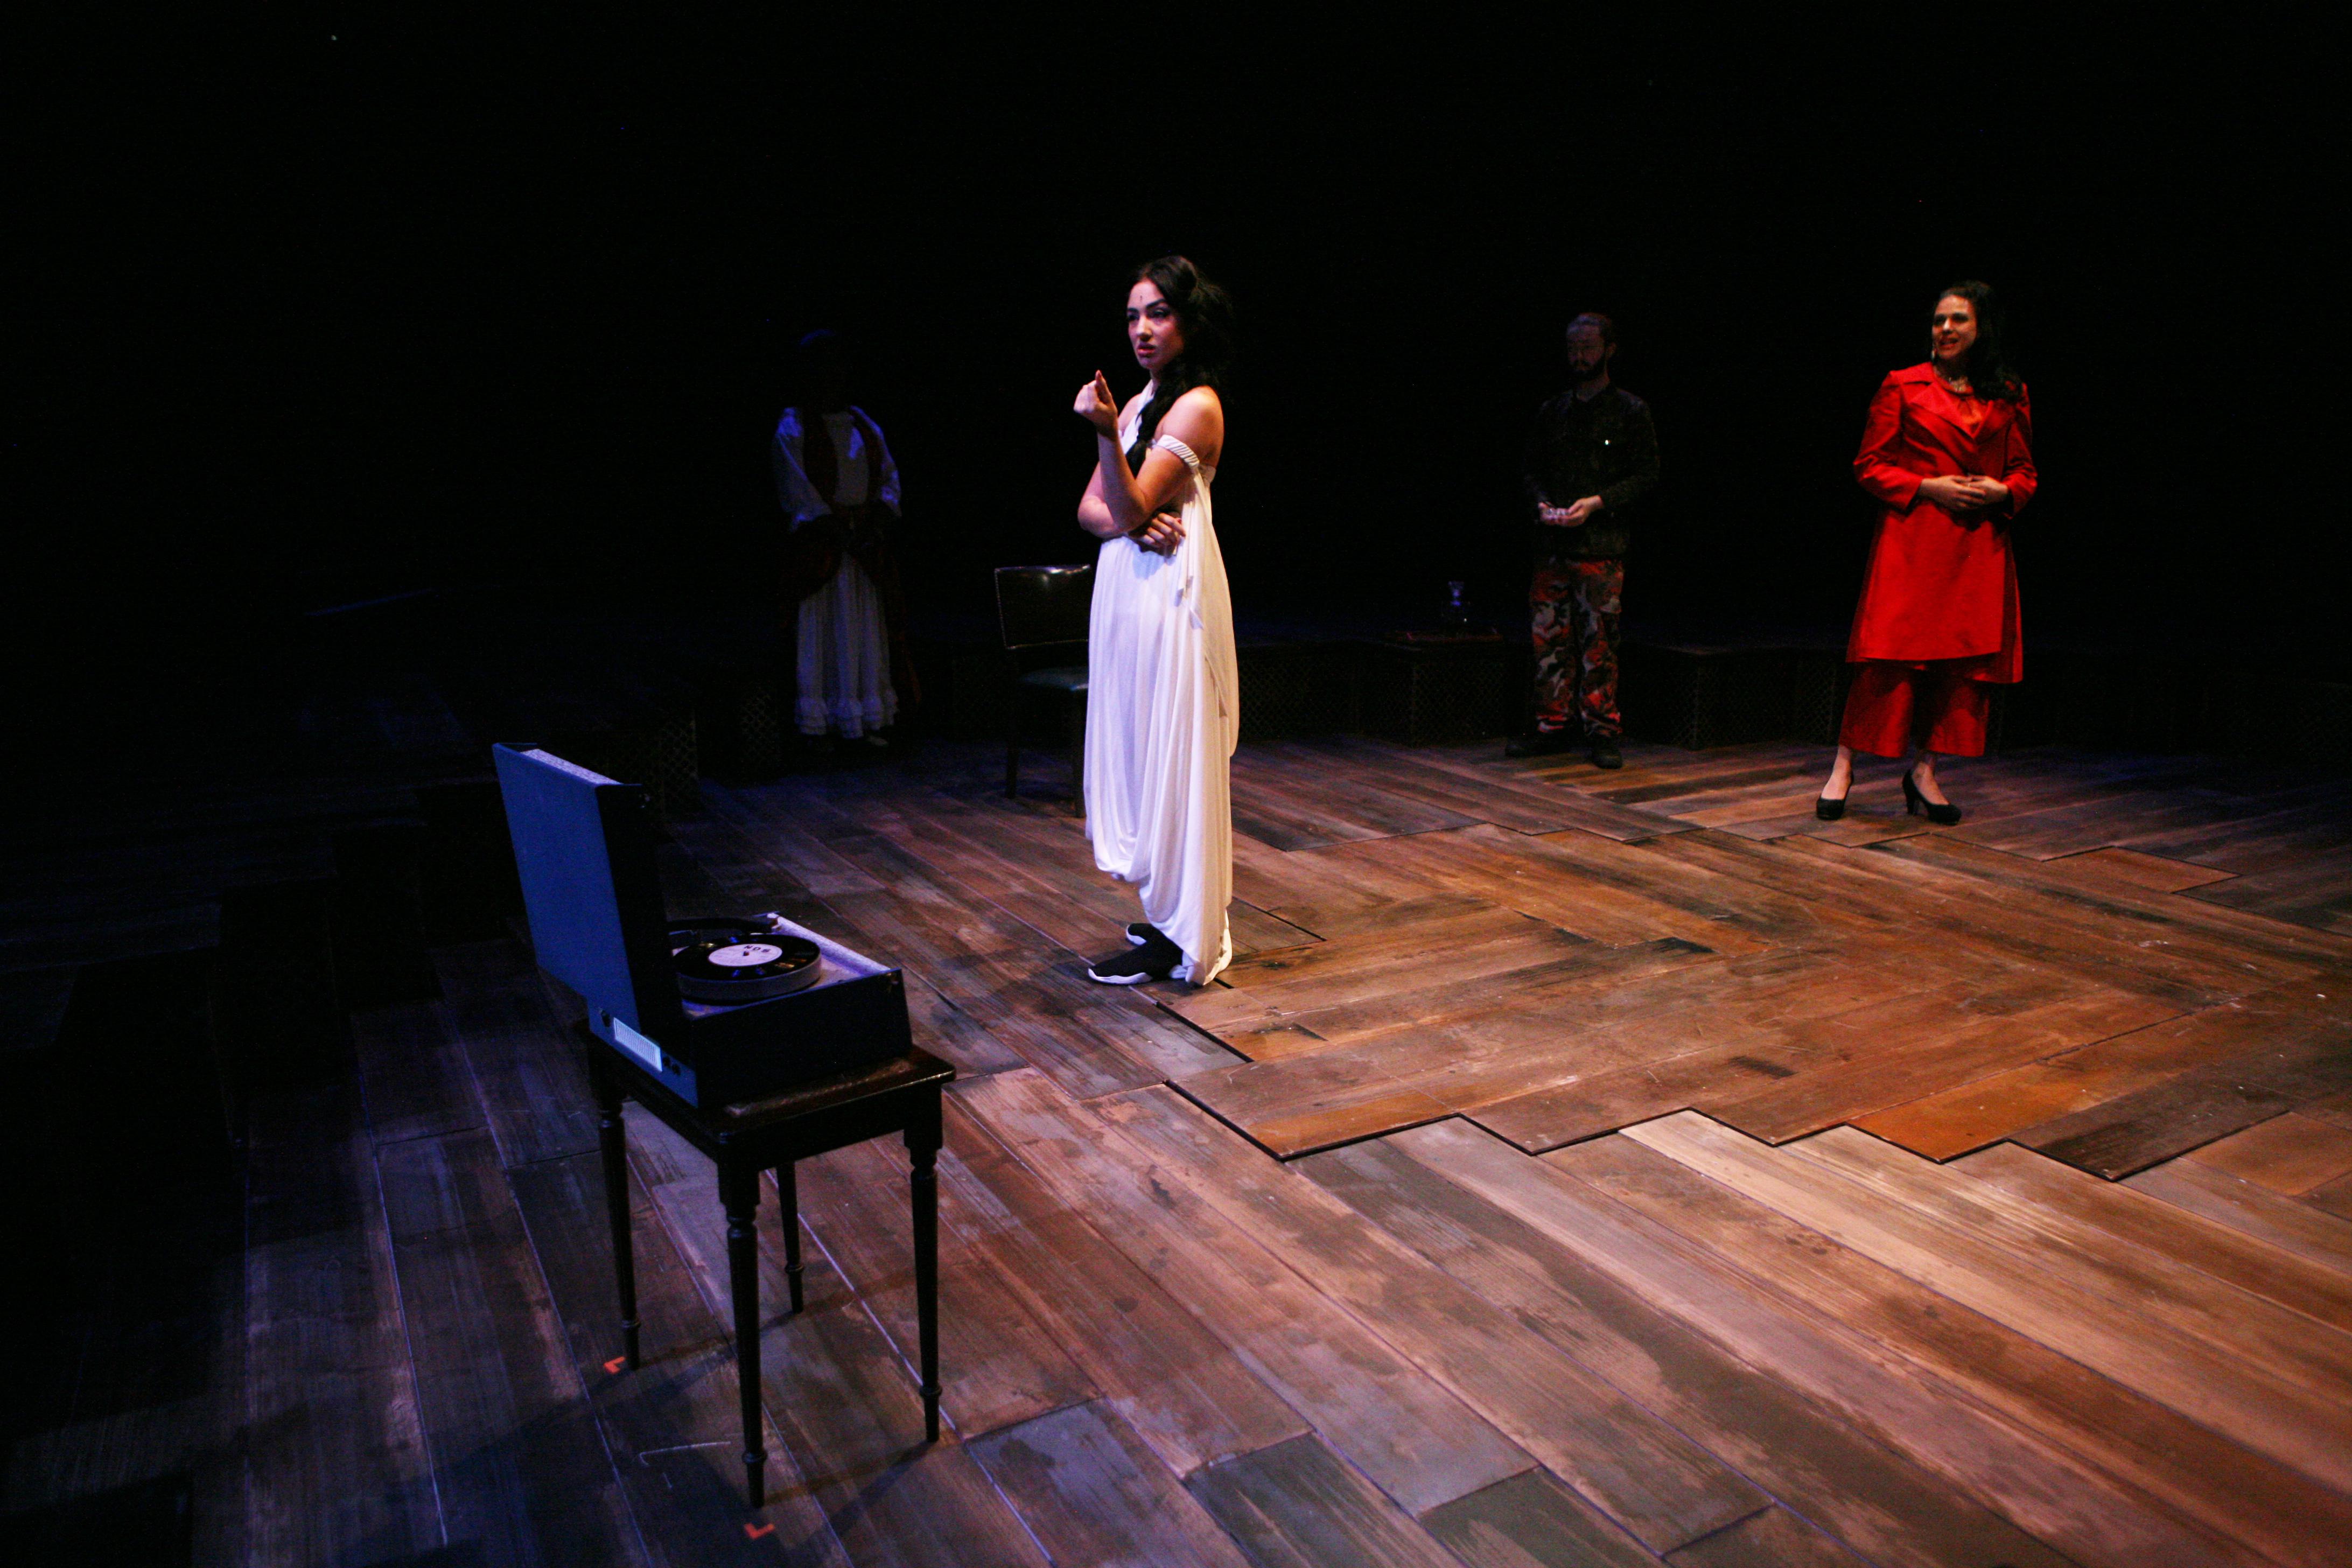 Zelina Rebeiro & Asha Kingsley in Romeo & Juliet, photo by Gary Calton GC280517144